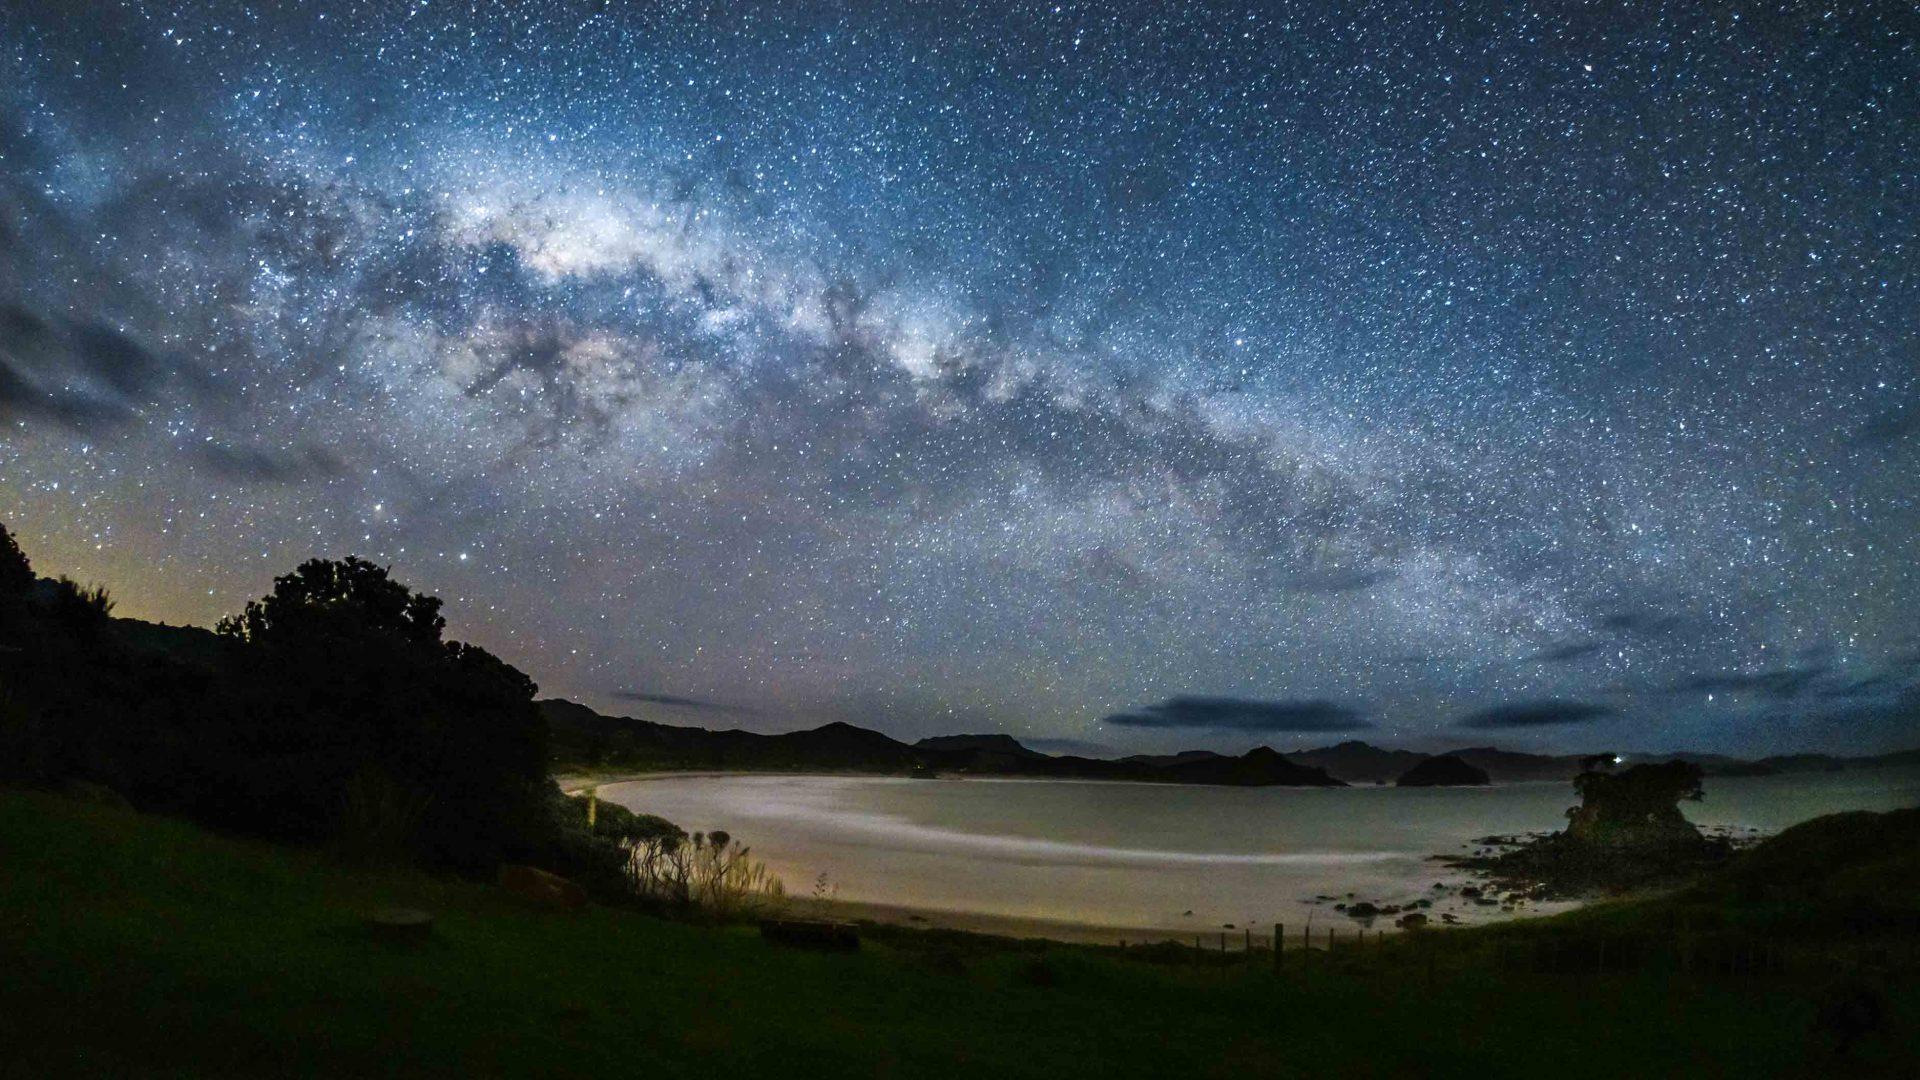 The night sky over Great Barrier Island, the world's first Dark Sky Sanctuary island.